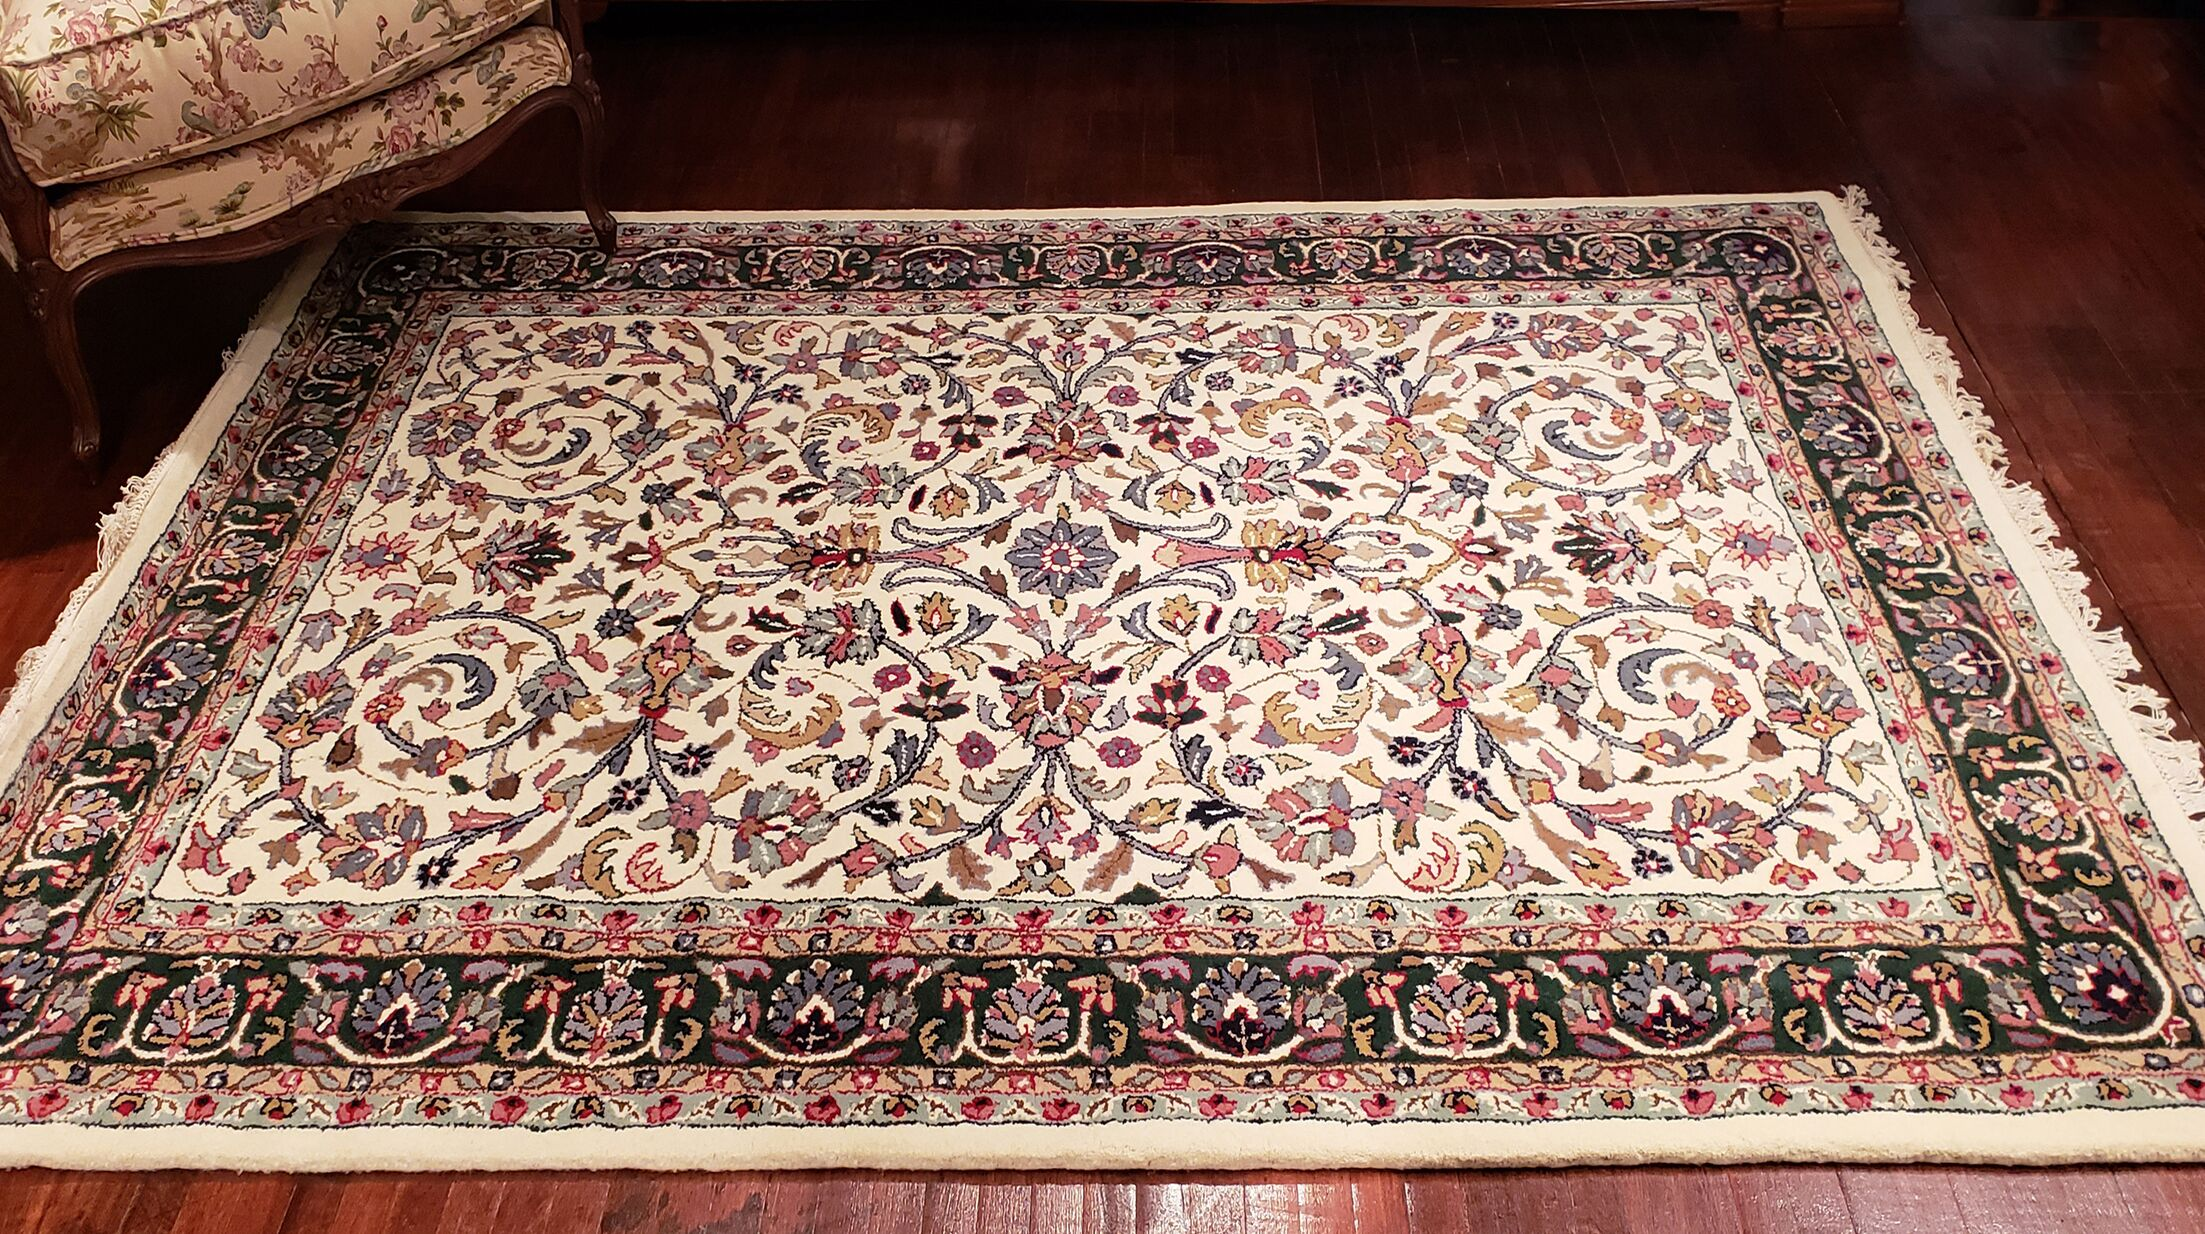 American Home Classic Kashan Ivory/Emerald Area Rug Rug Size: 8'6